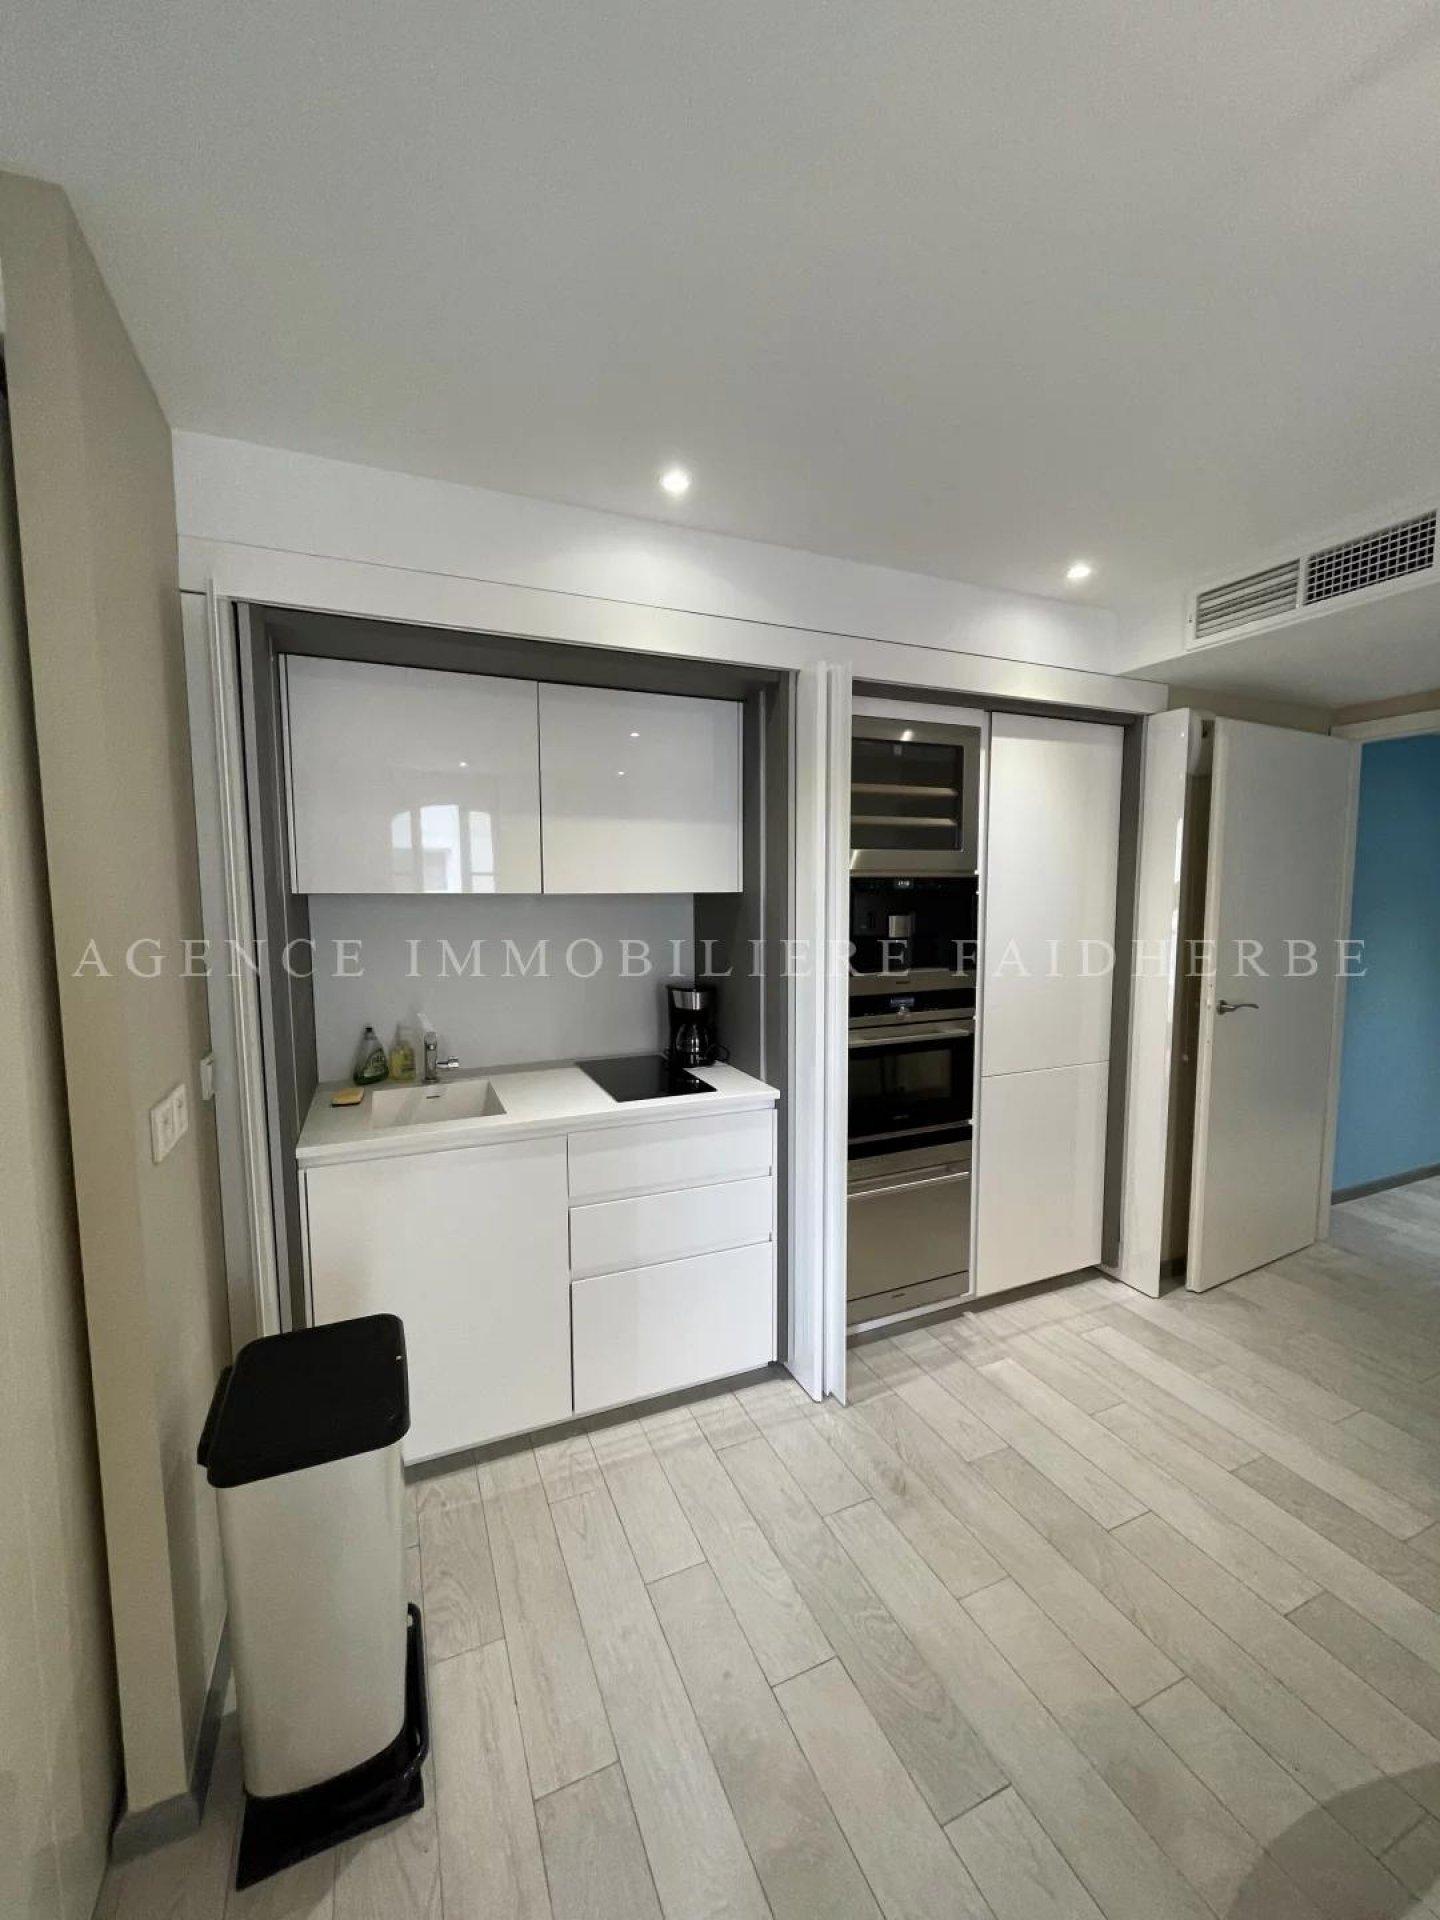 Seasonal rental Apartment - Saint-Tropez Centre